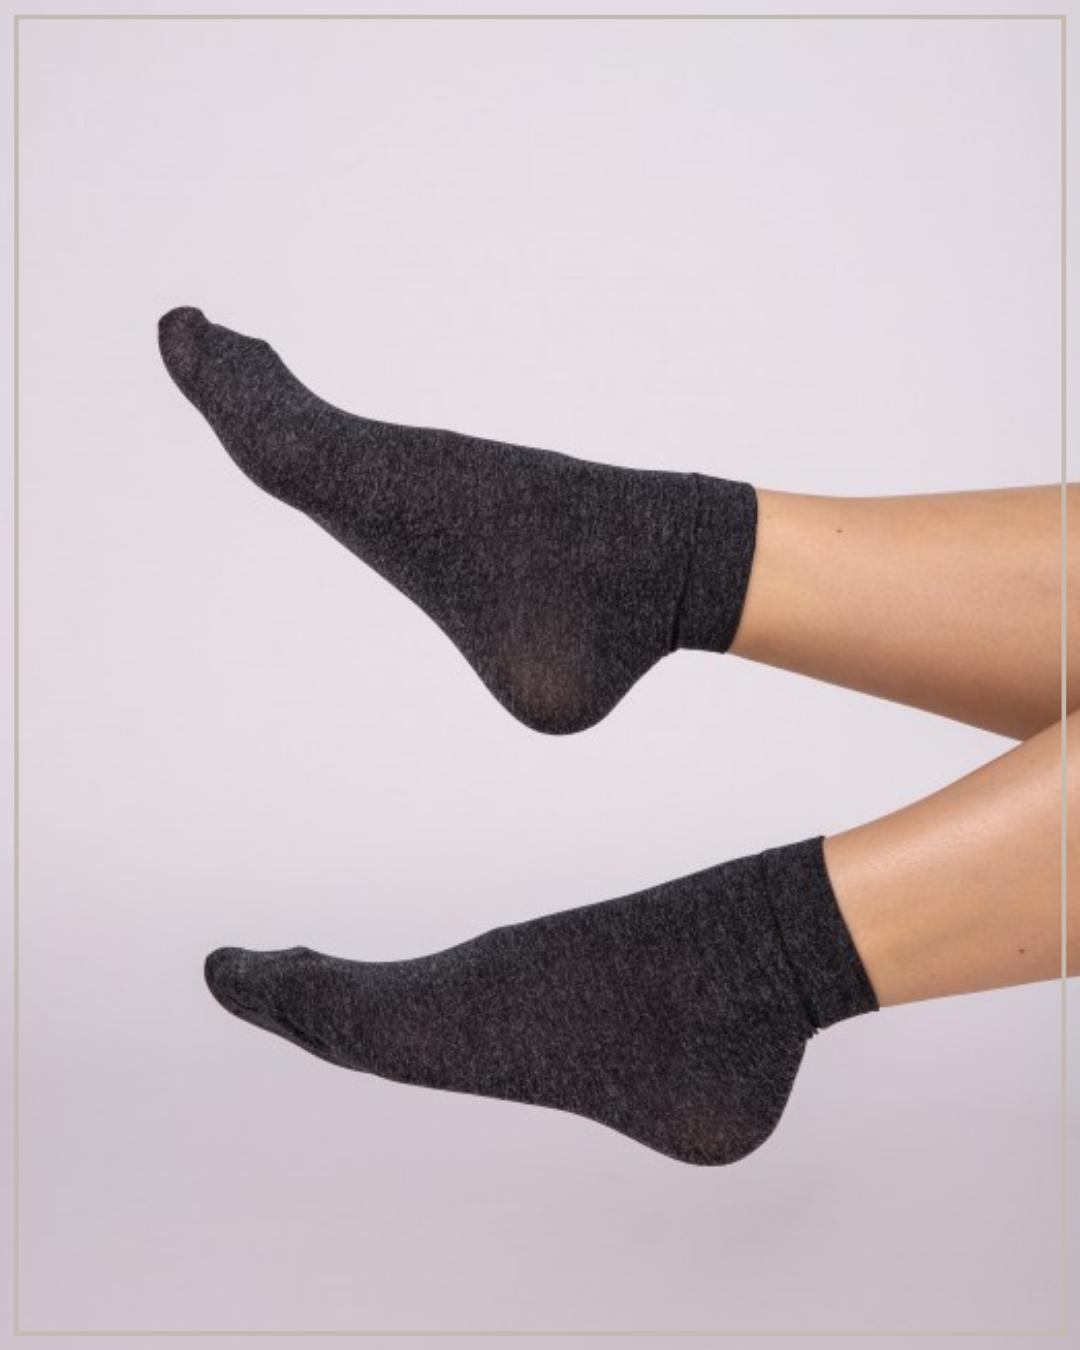 60 den pilkos, melanžinės kojinaitės, 2 poros